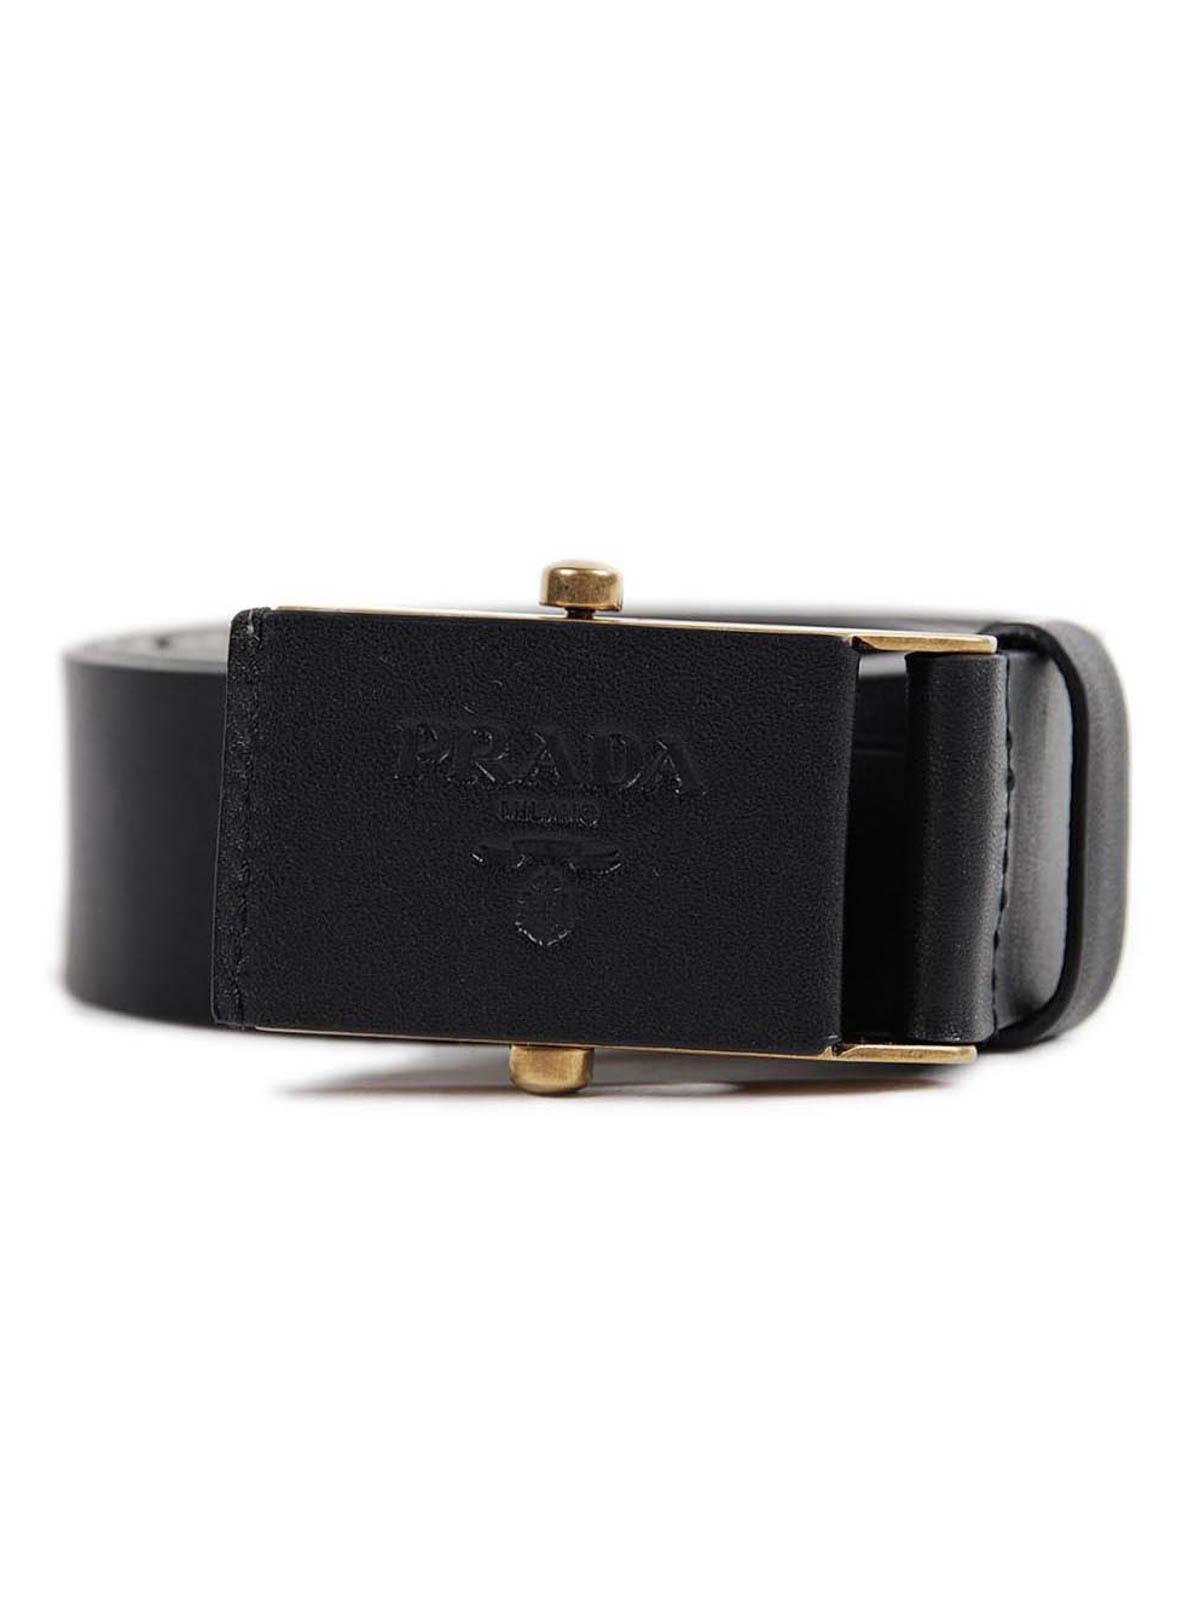 Iconic buckle leather belt by Prada - belts | iKRIX